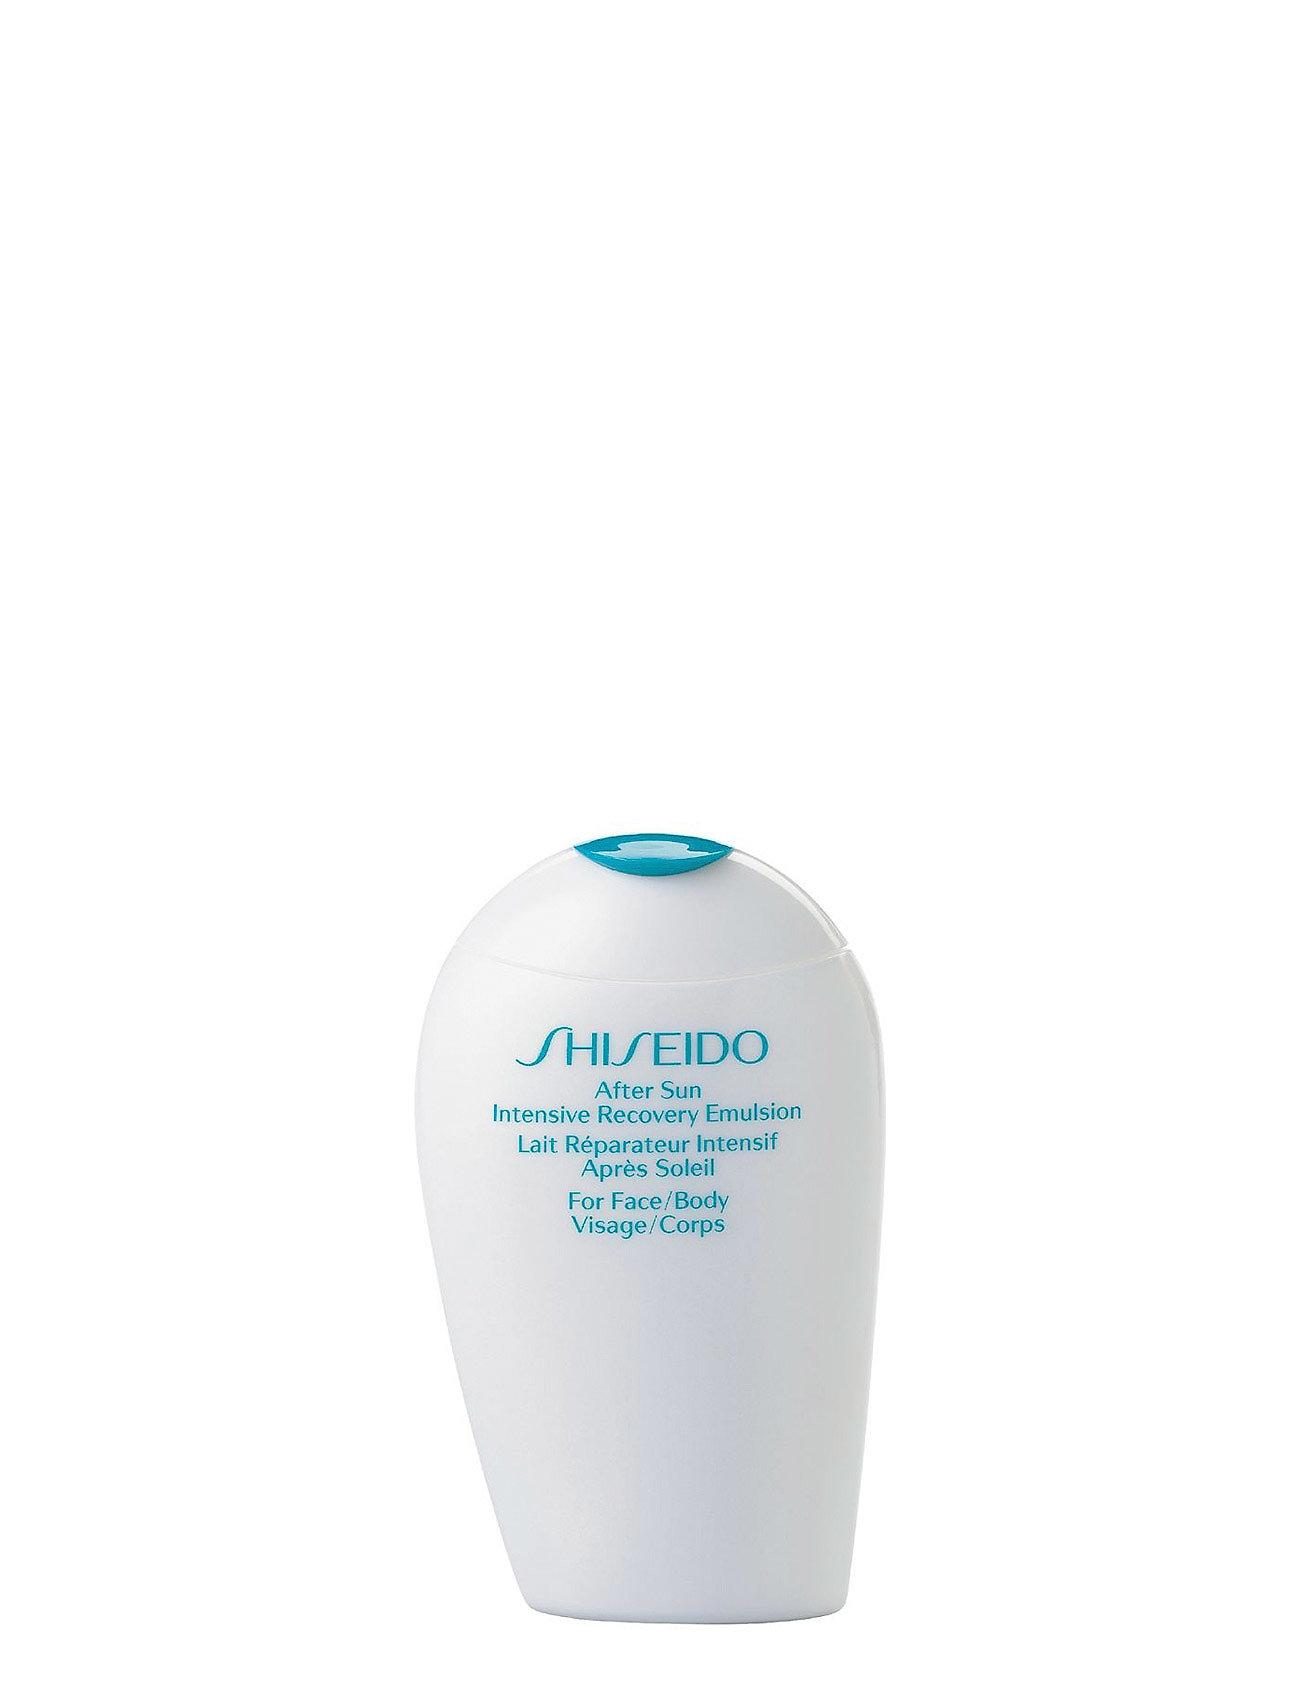 Shiseido after sun intensive recove fra shiseido fra boozt.com dk